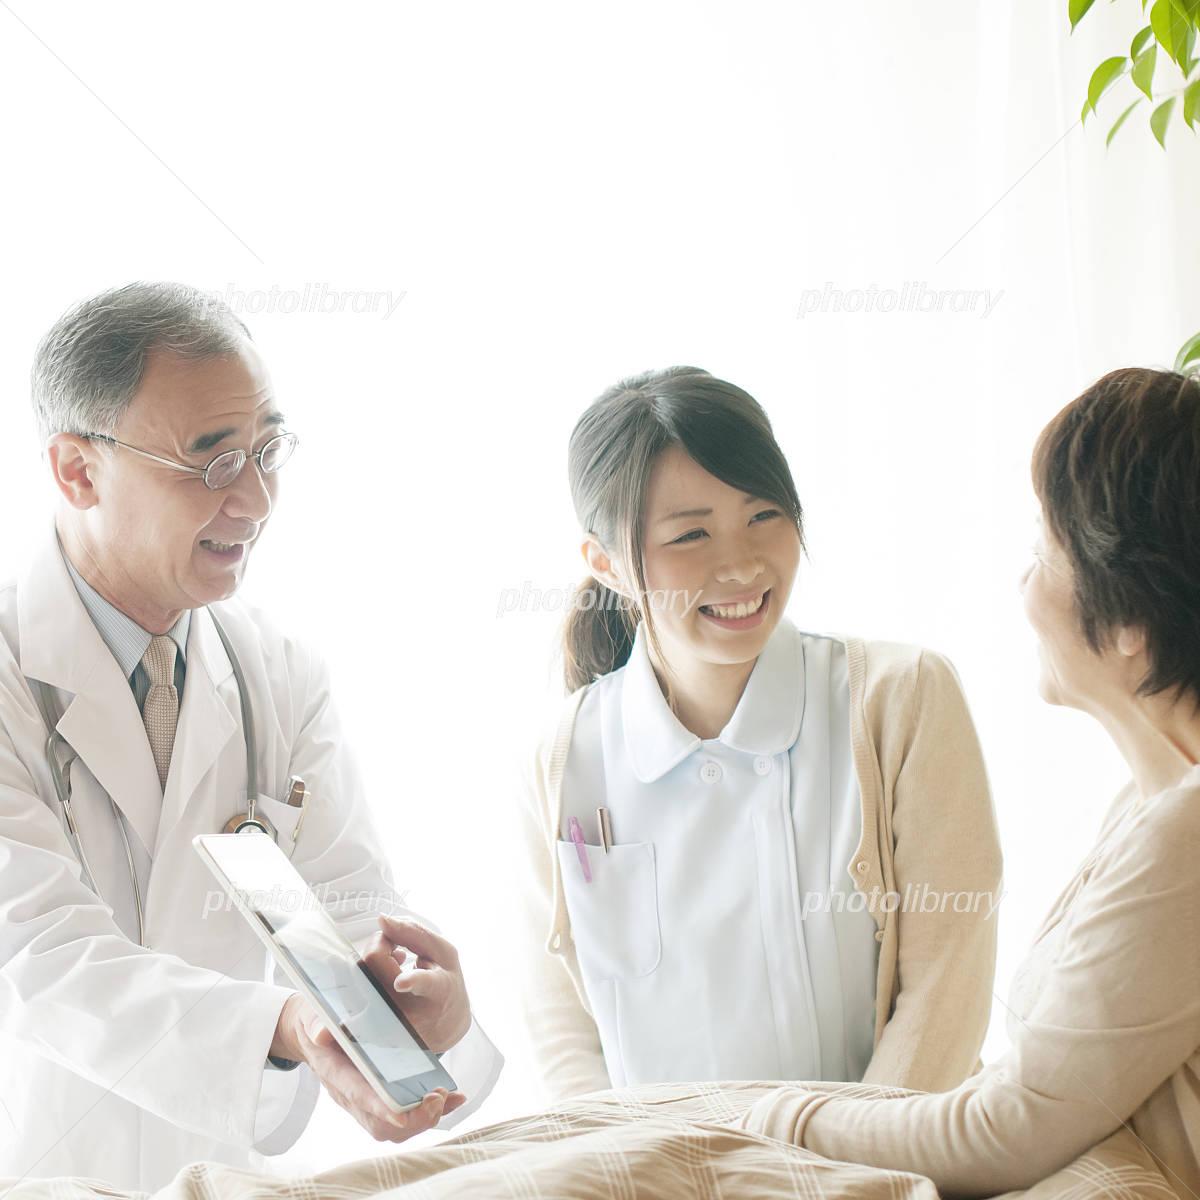 Visit medical Photo